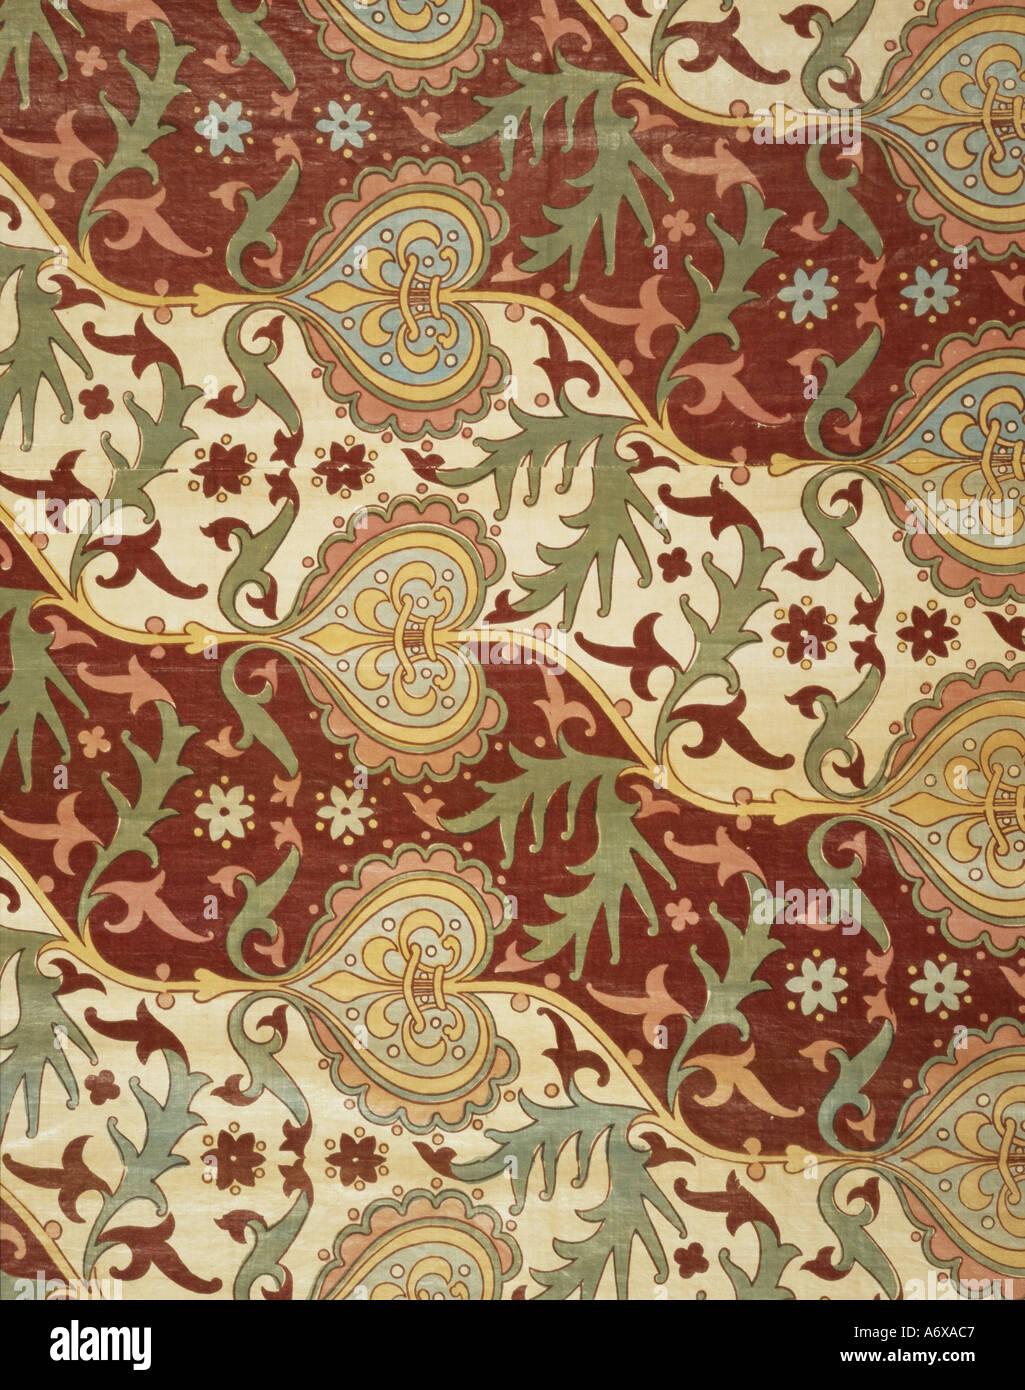 Arabesque gotica, tessili da A.W.N. Pugin. Inghilterra, metà del XIX secolo. Immagini Stock